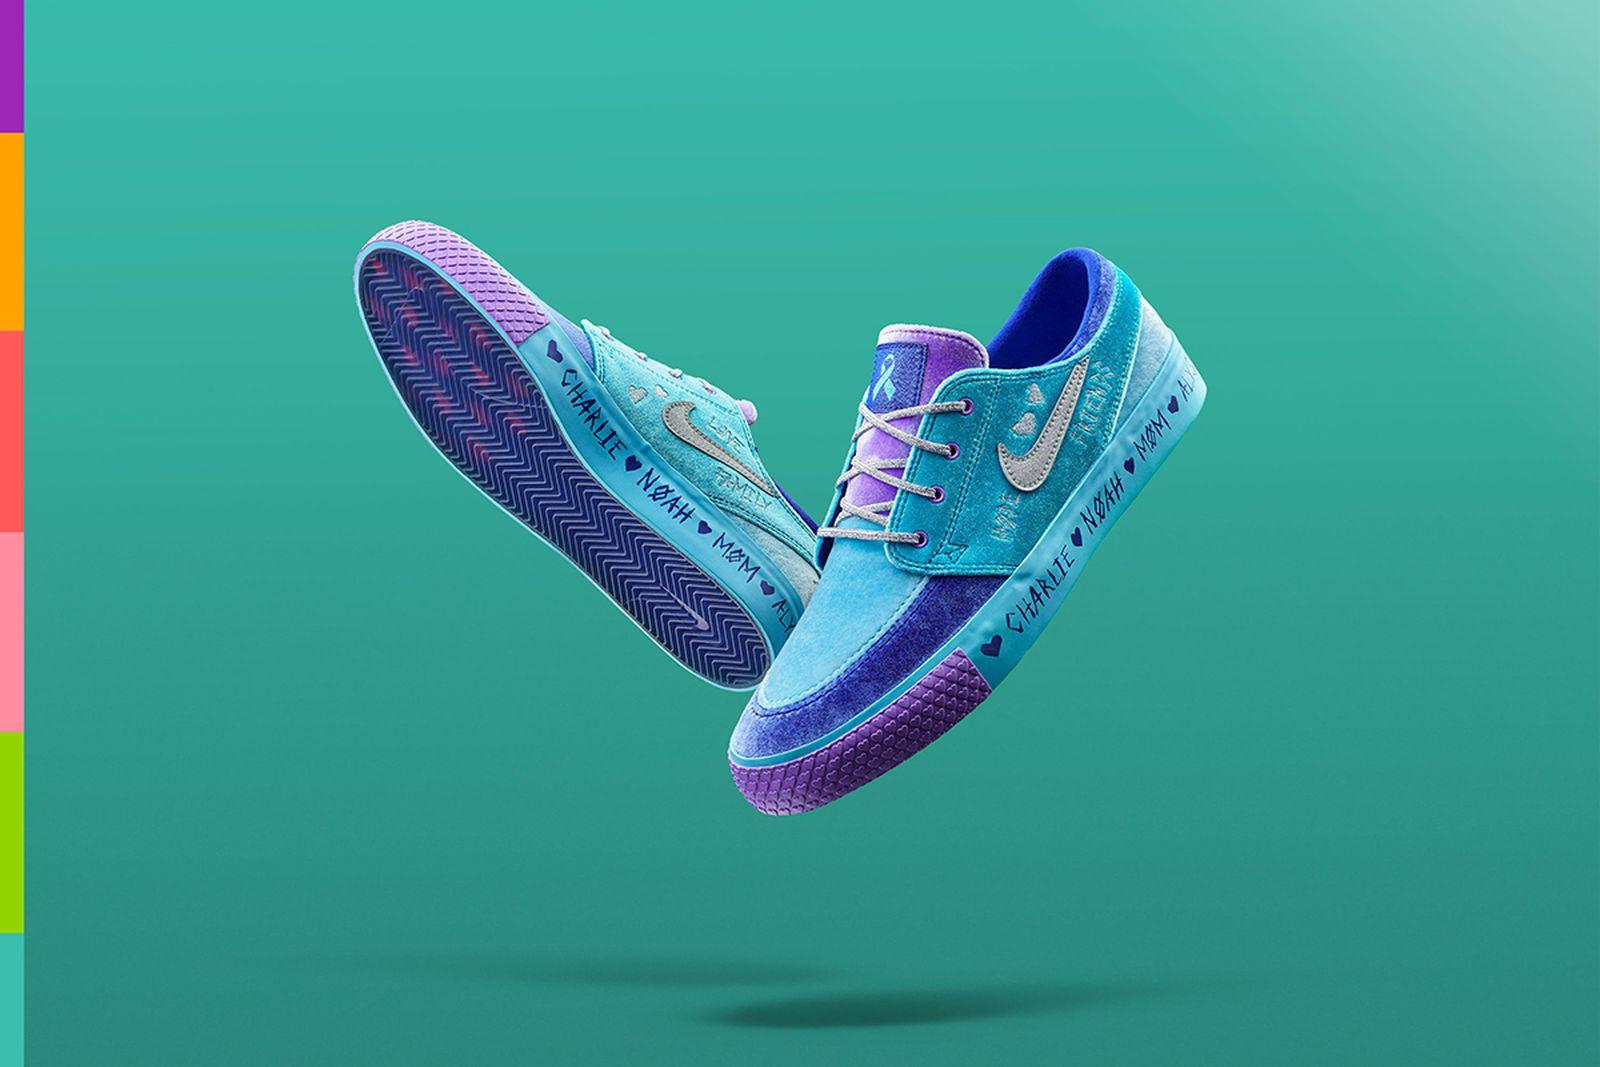 Nike Doernbecher Freestyle 2019 Zoom Janoski